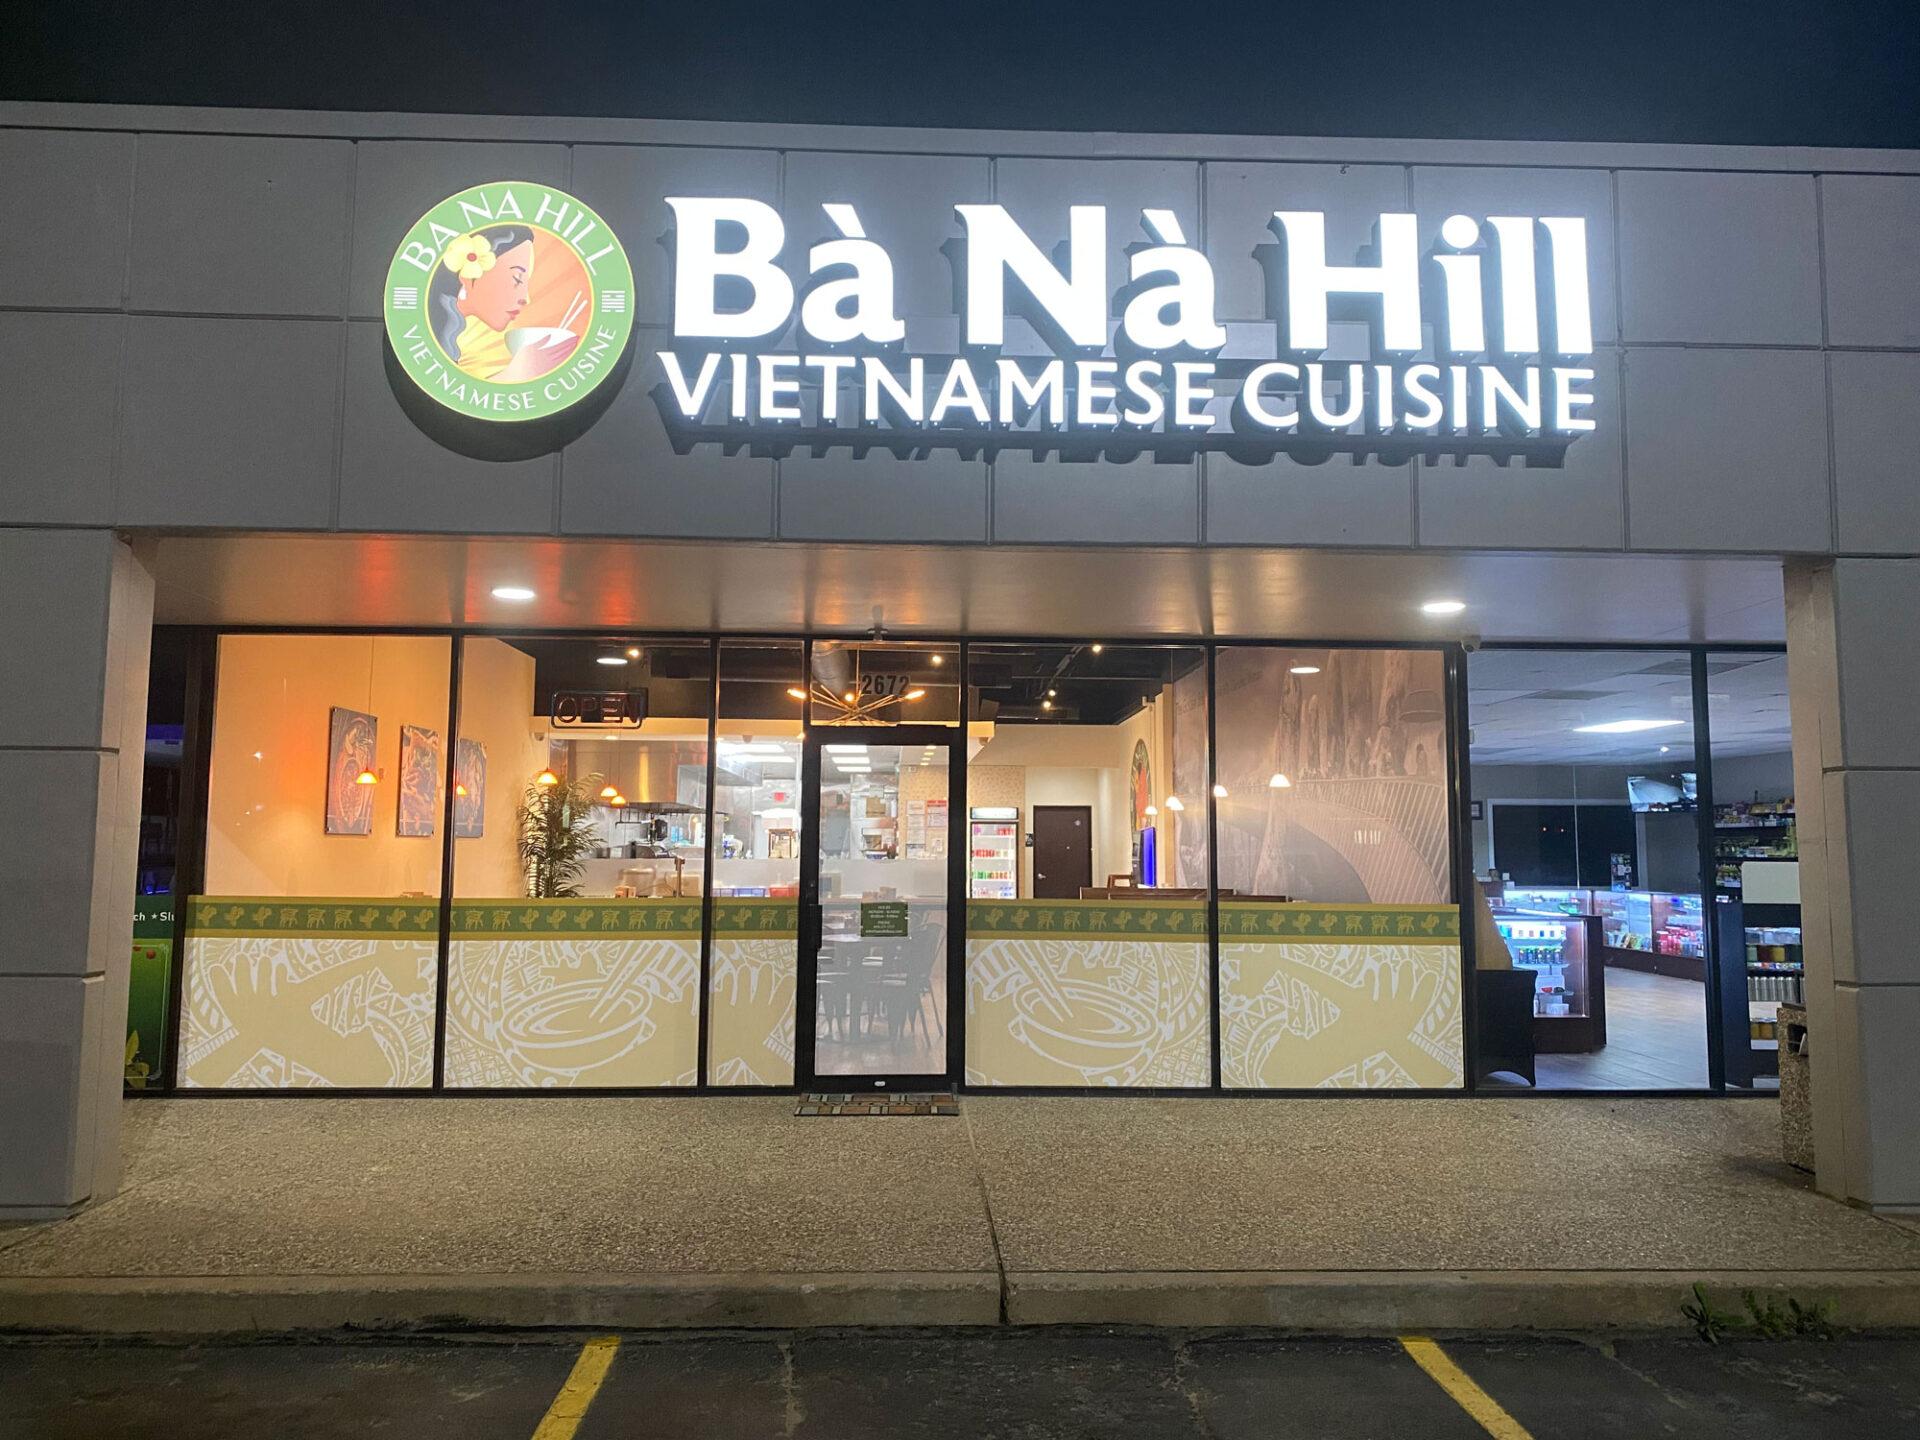 Ba Na Hill Vietnamese Cuisine